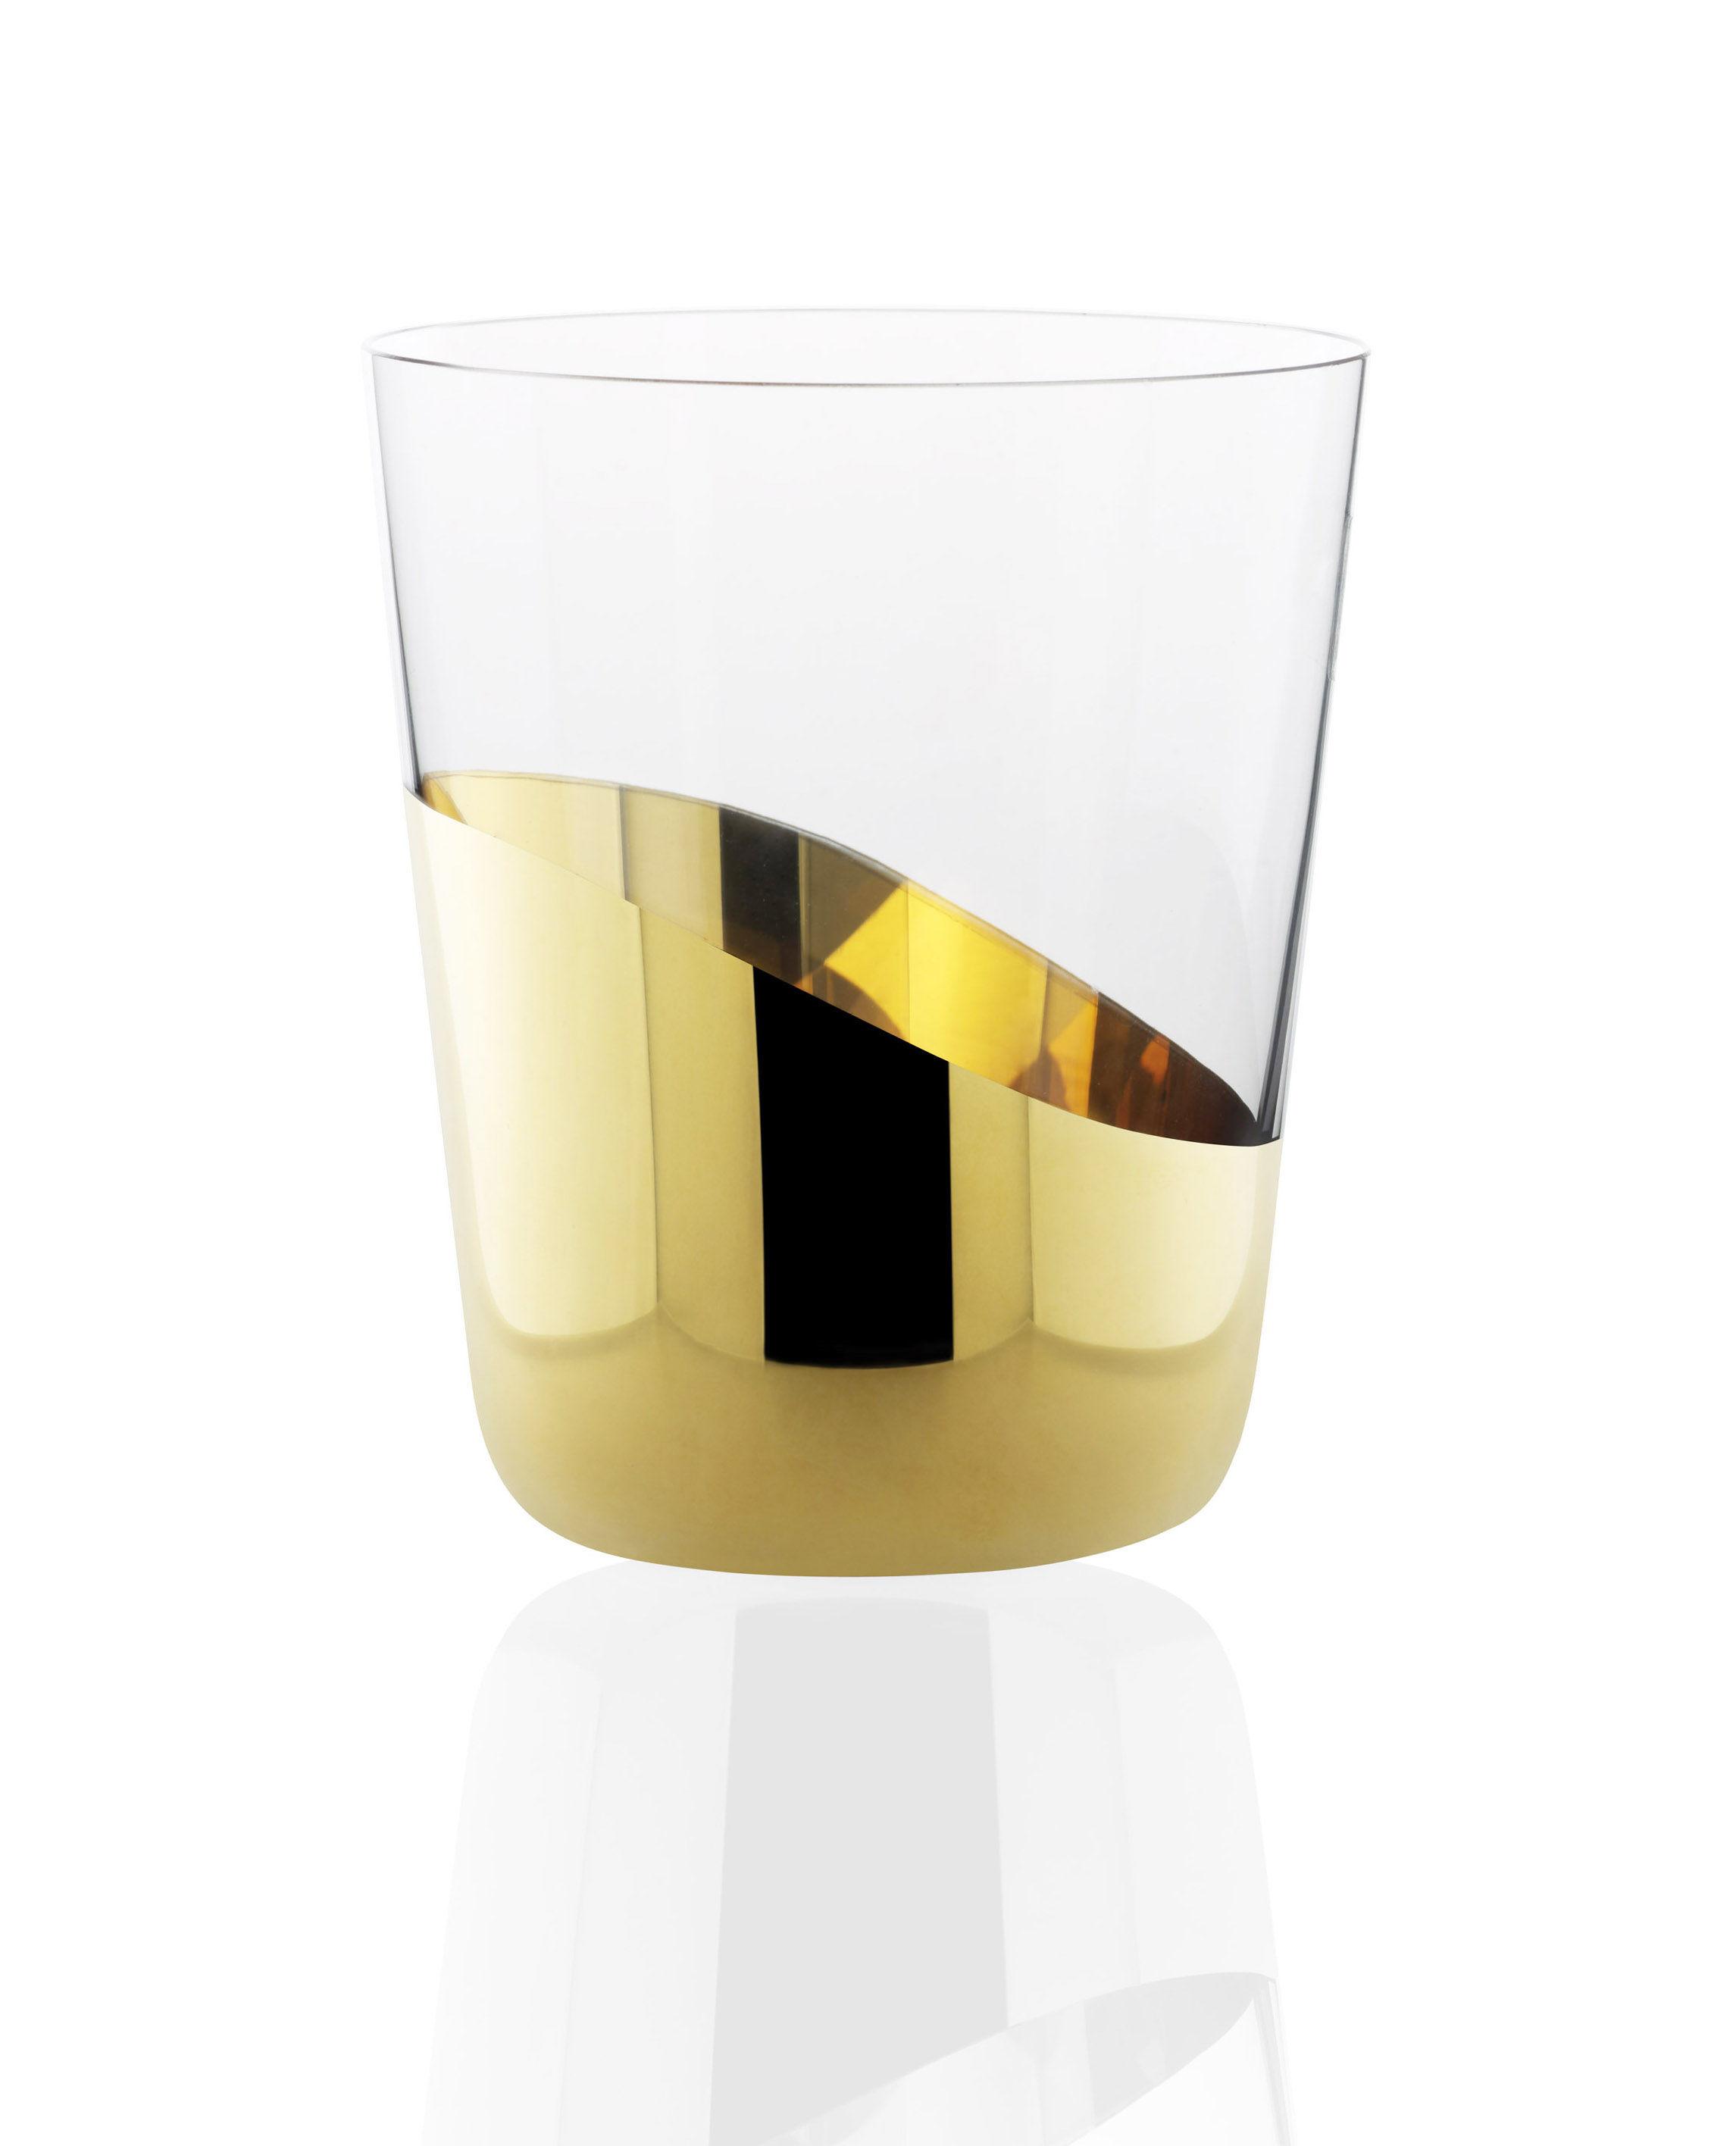 verre eau midas lot de 2 h 10 cm verre eau h 10 cm or skitsch made in design. Black Bedroom Furniture Sets. Home Design Ideas